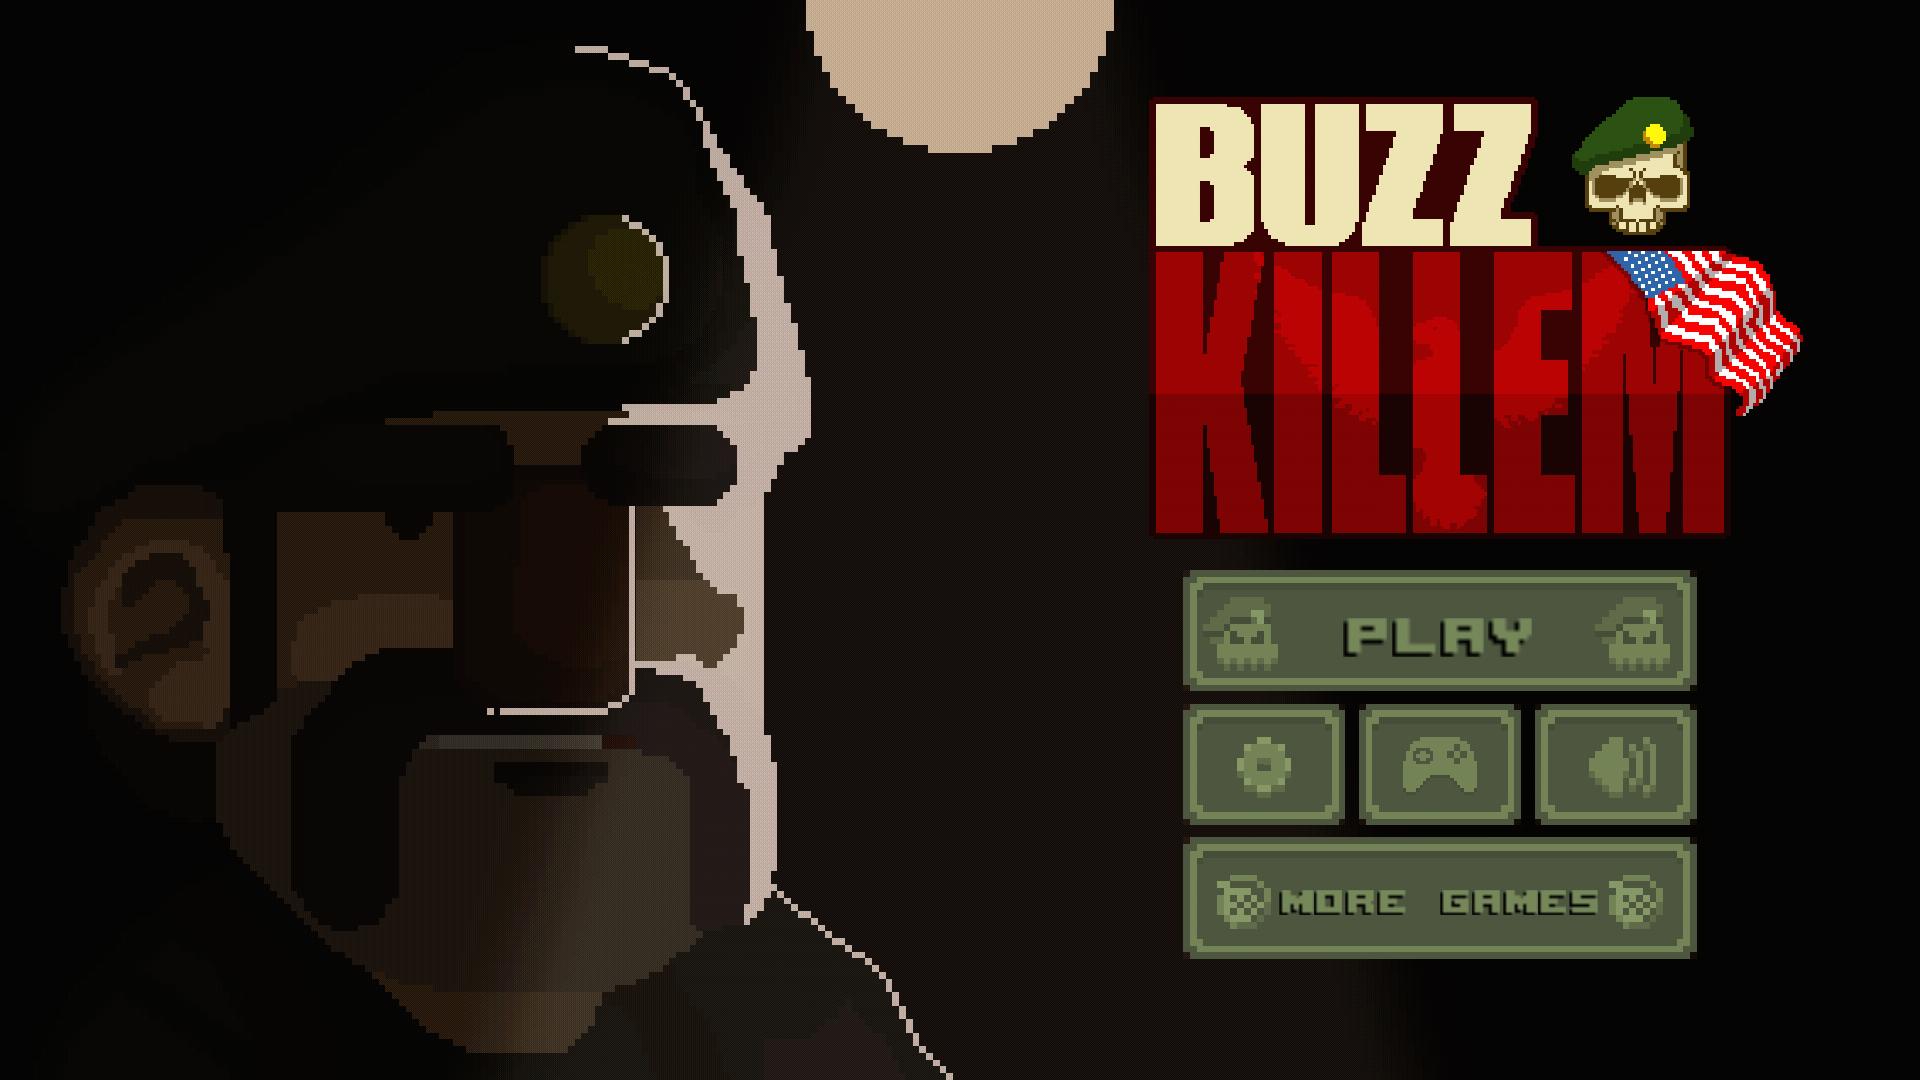 Buzz Killem screenshot #14